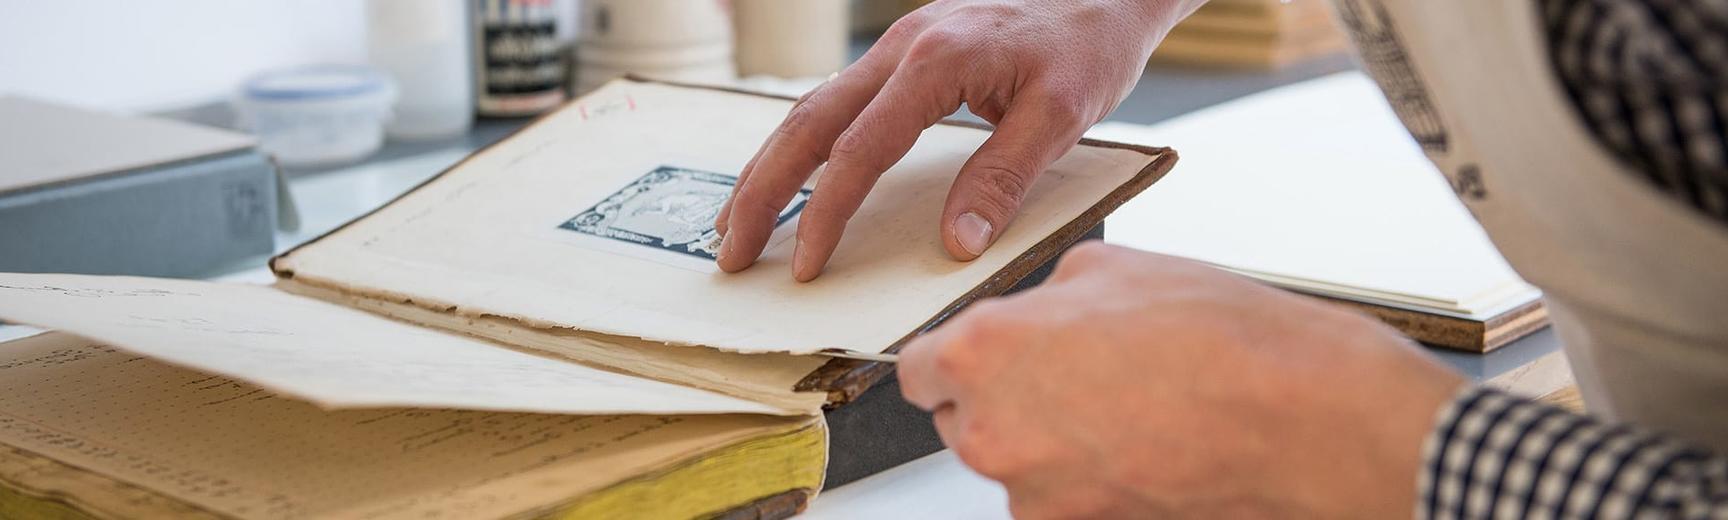 Book spine repair, Bodleian Libraries, Oxford